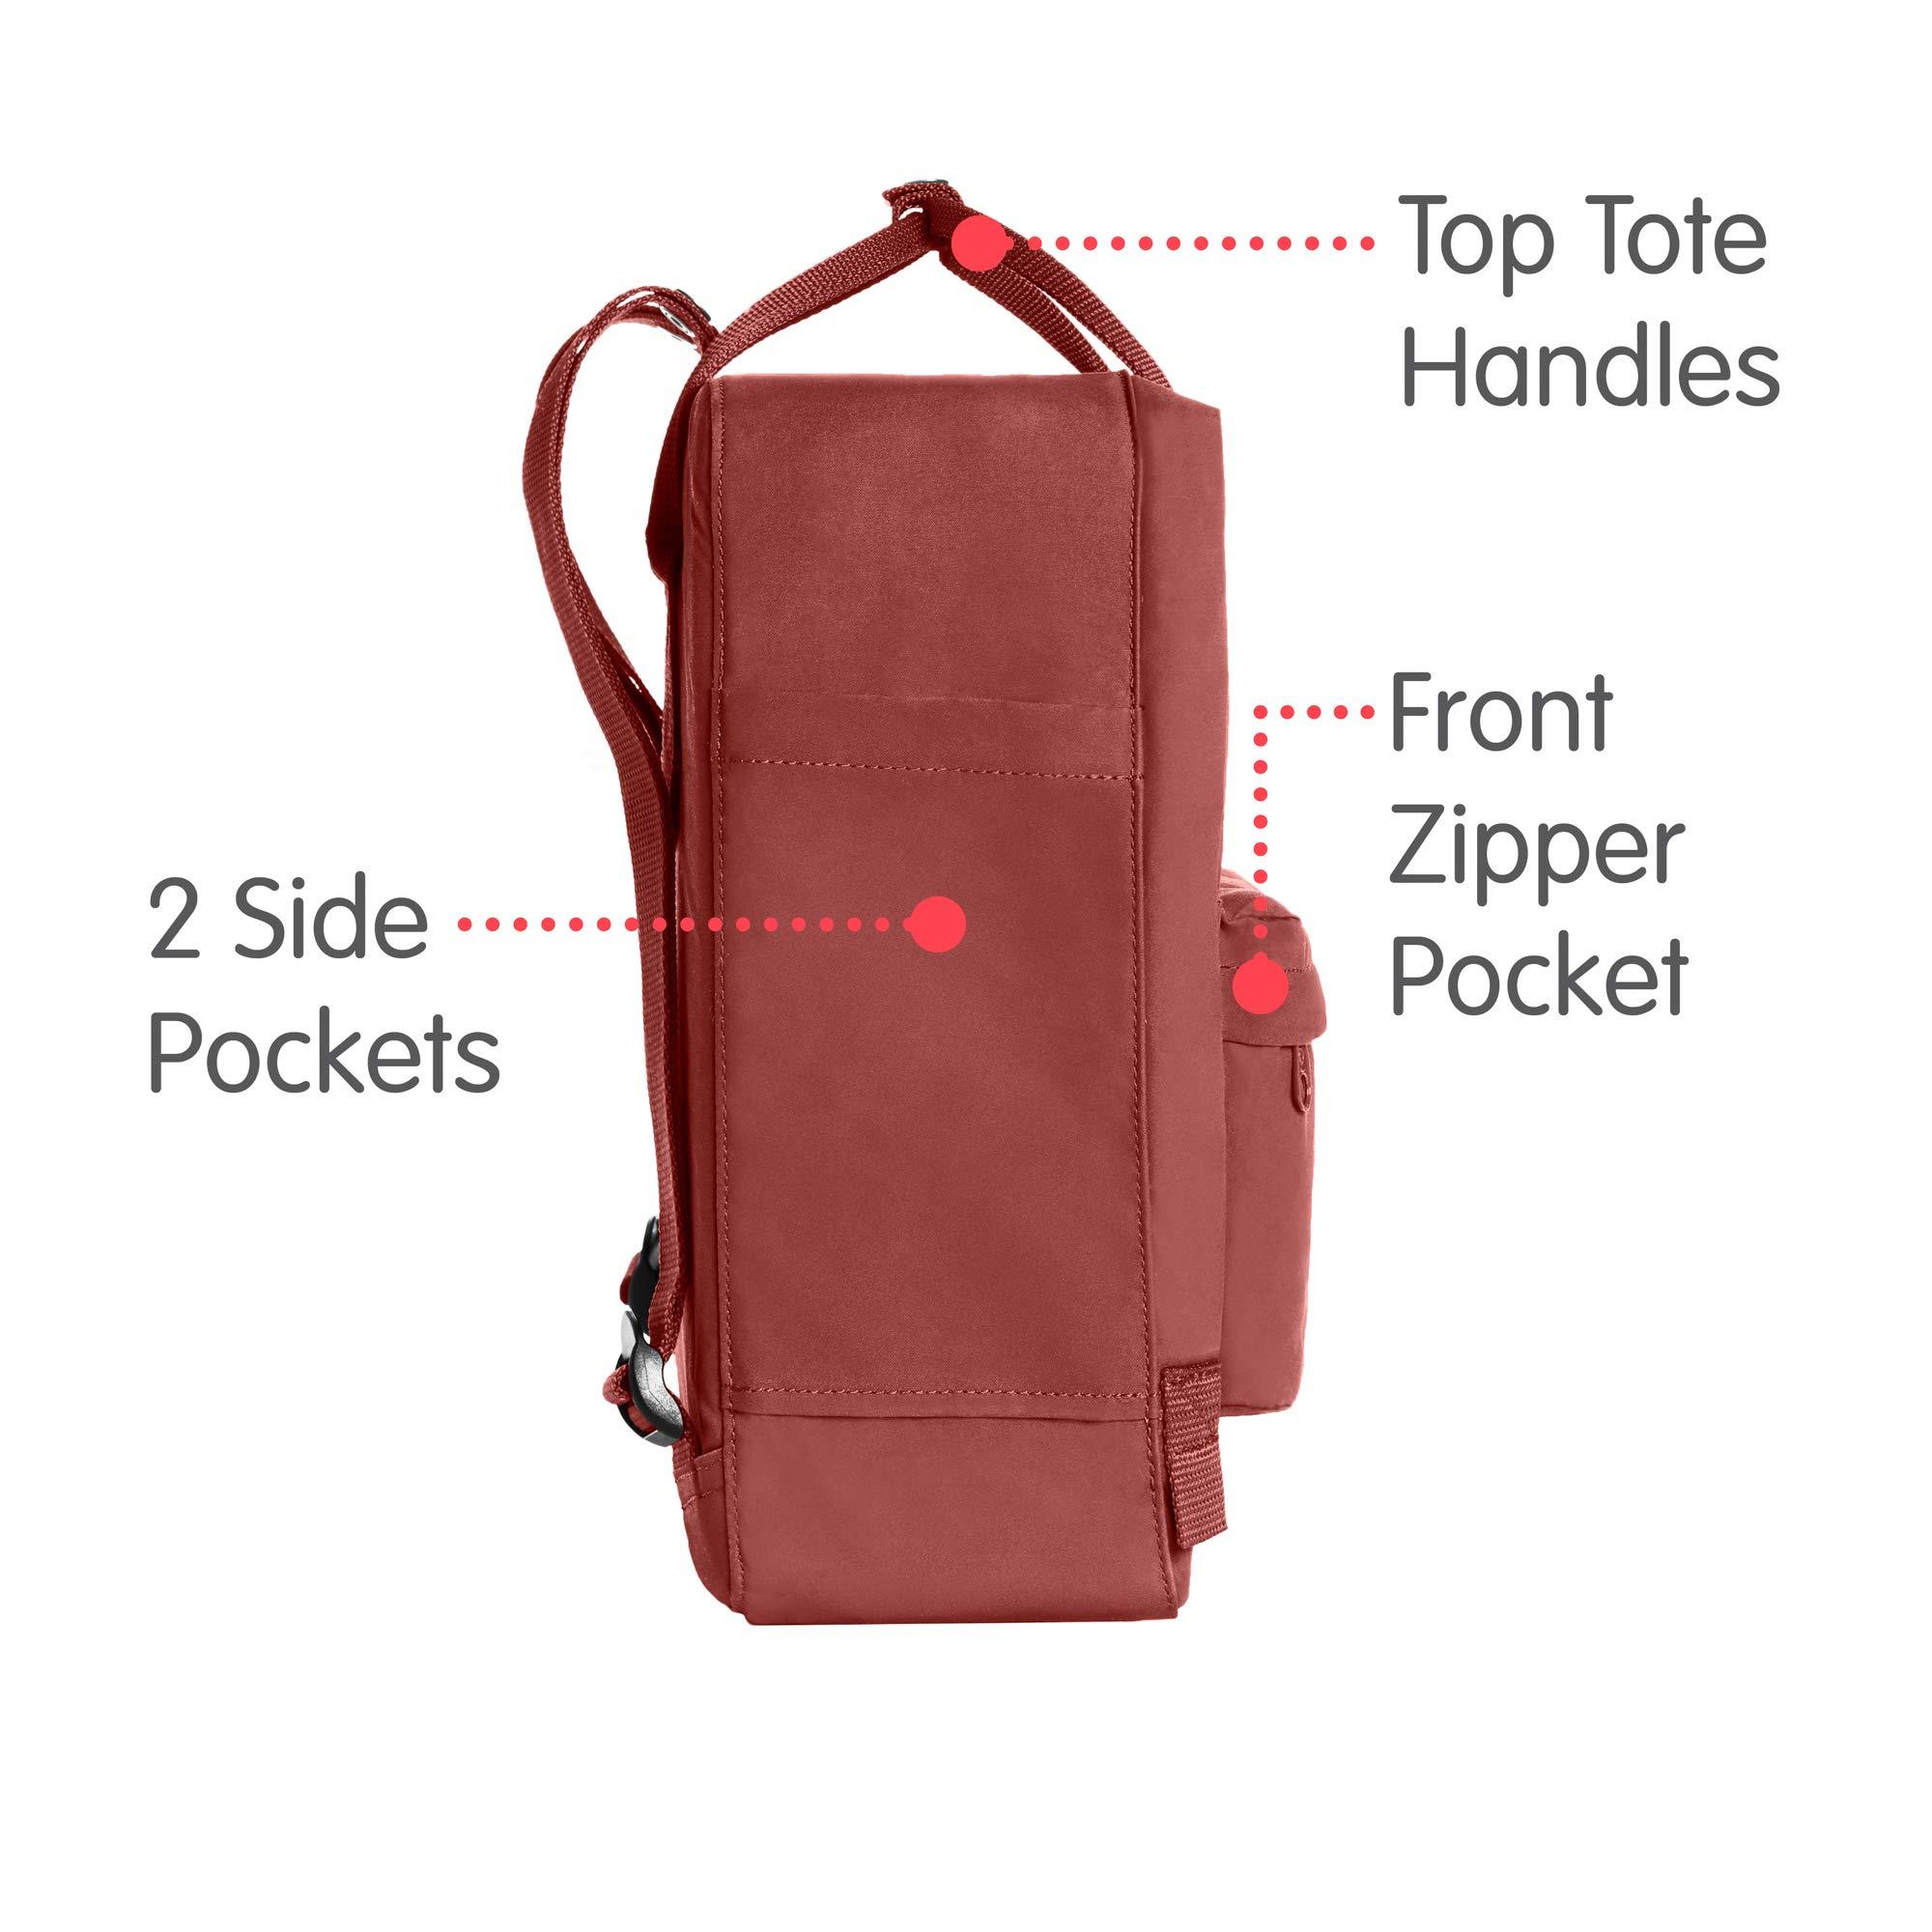 Fjallraven - Kanken Classic Backpack for Everyday, Dahlia by Fjallraven (Image #4)